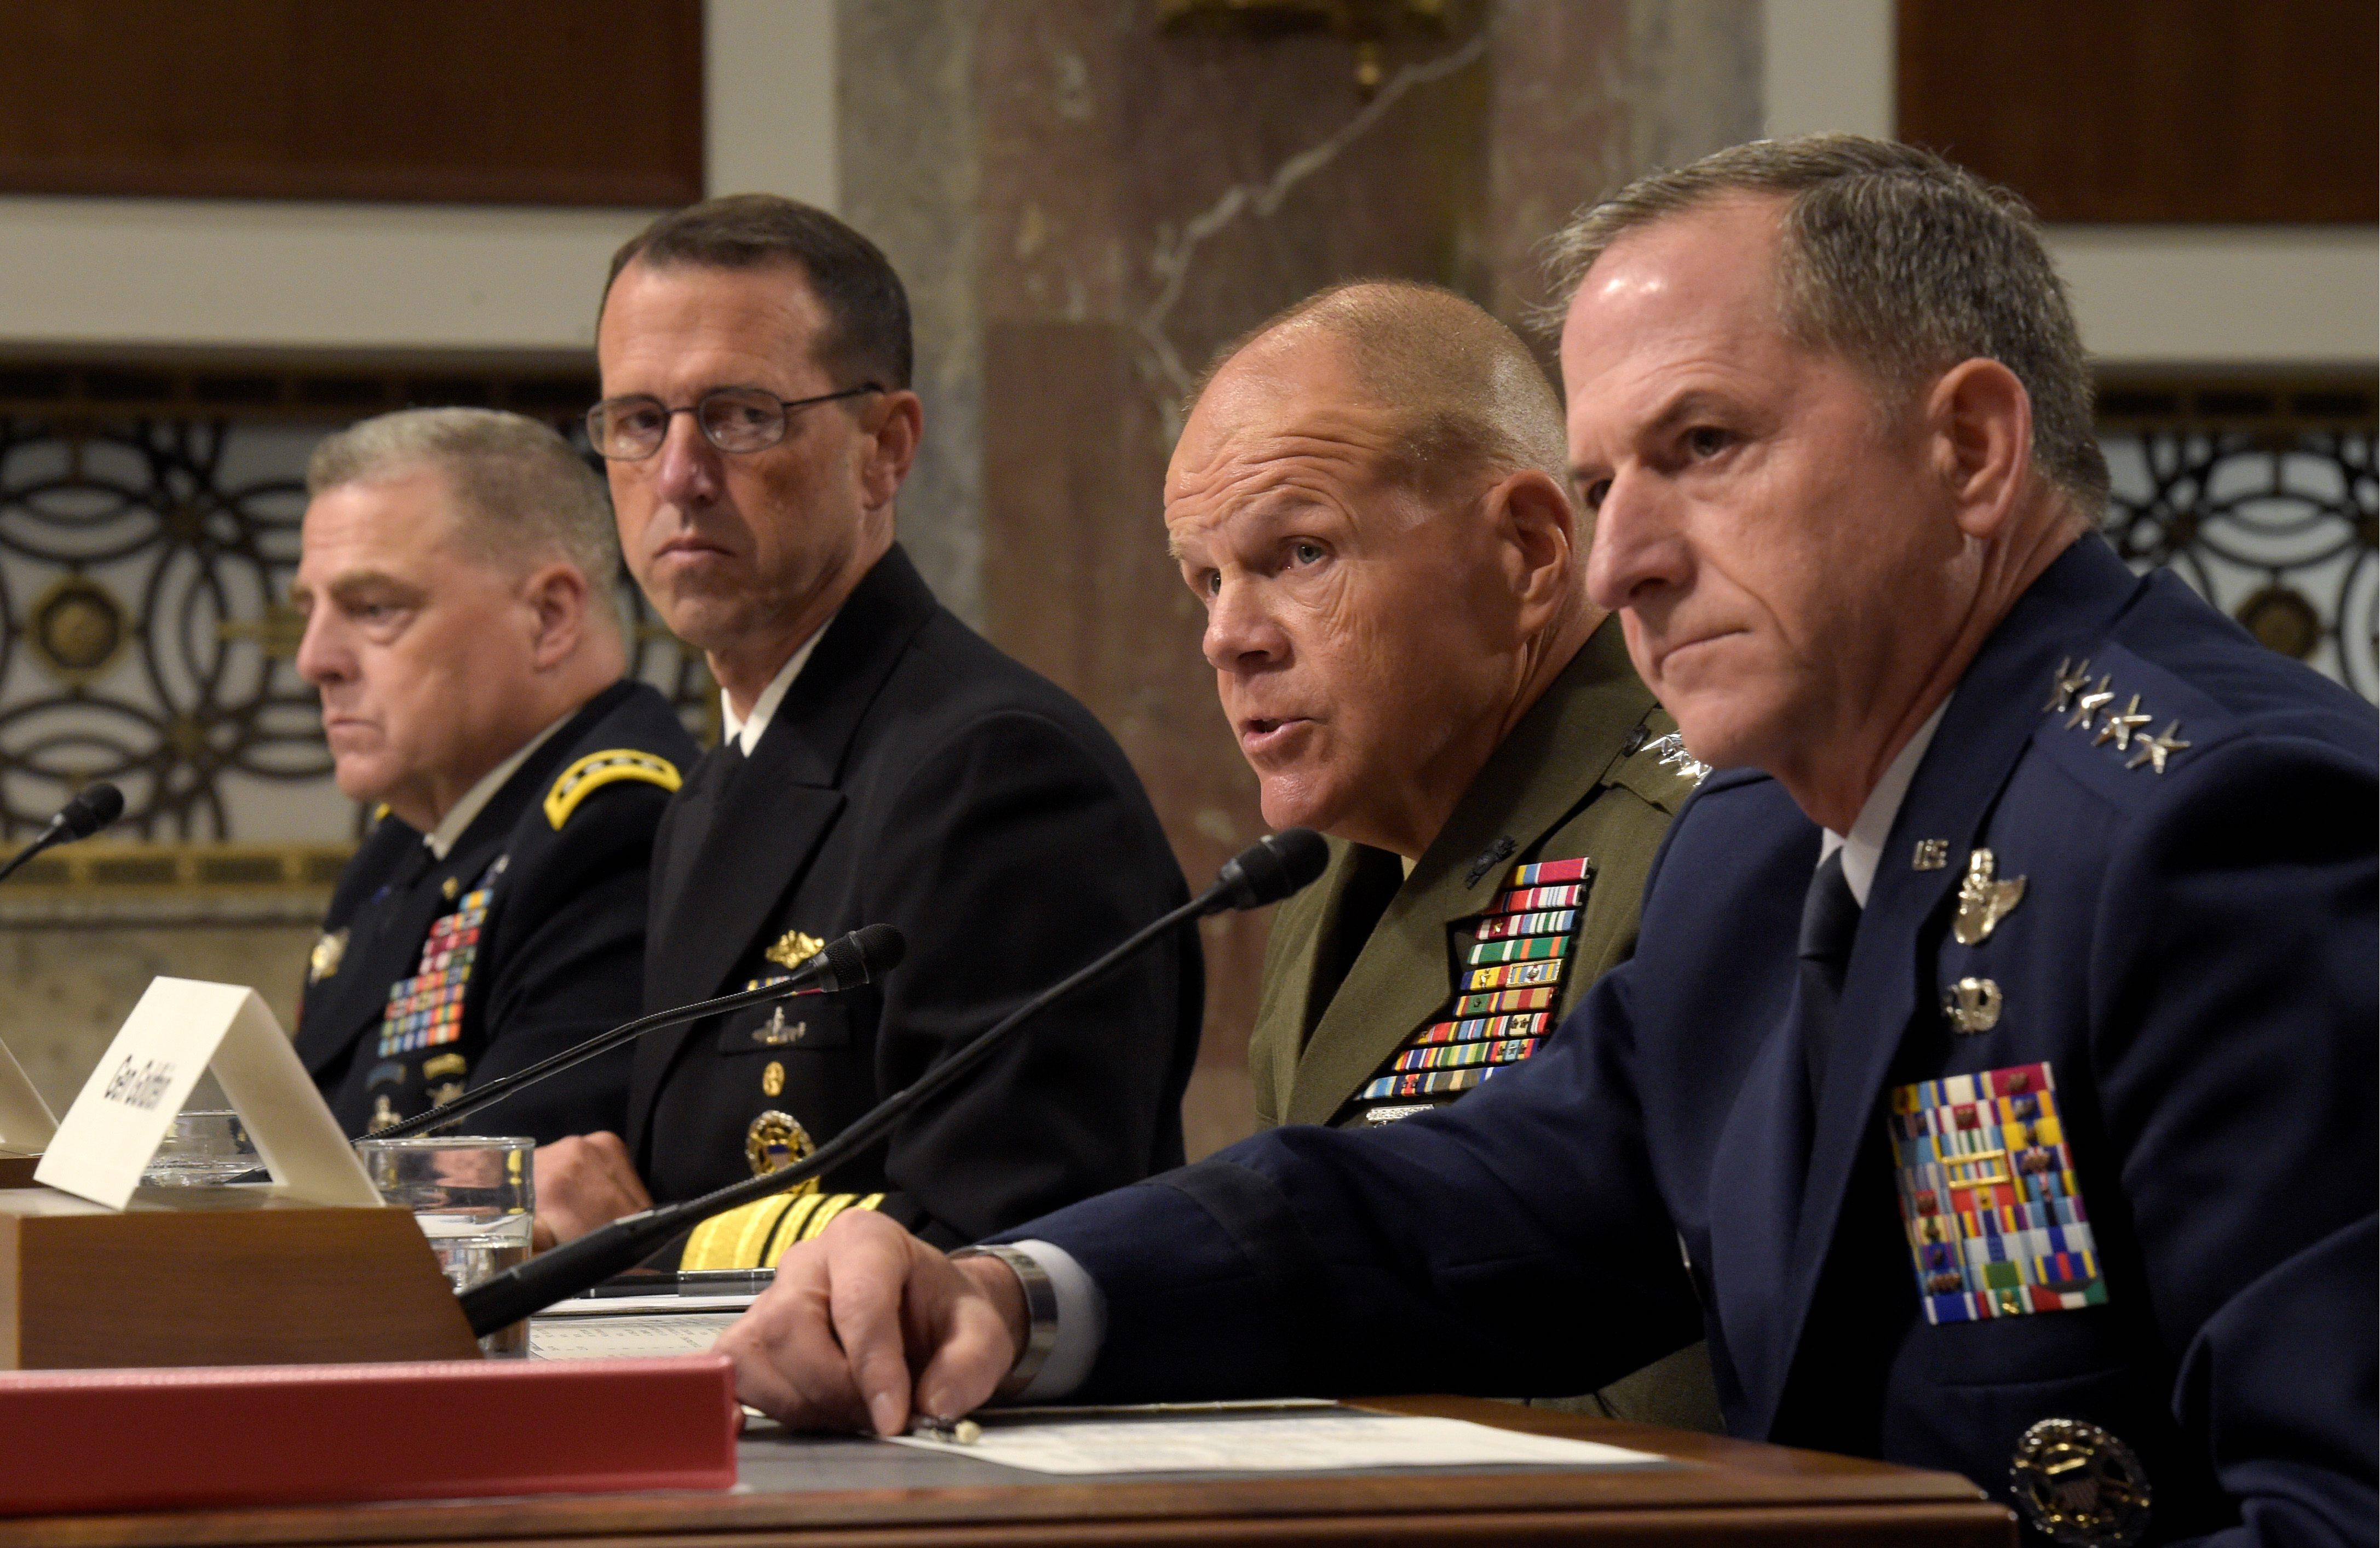 Obama wary of generals, admirals commanding in war - Washington Times